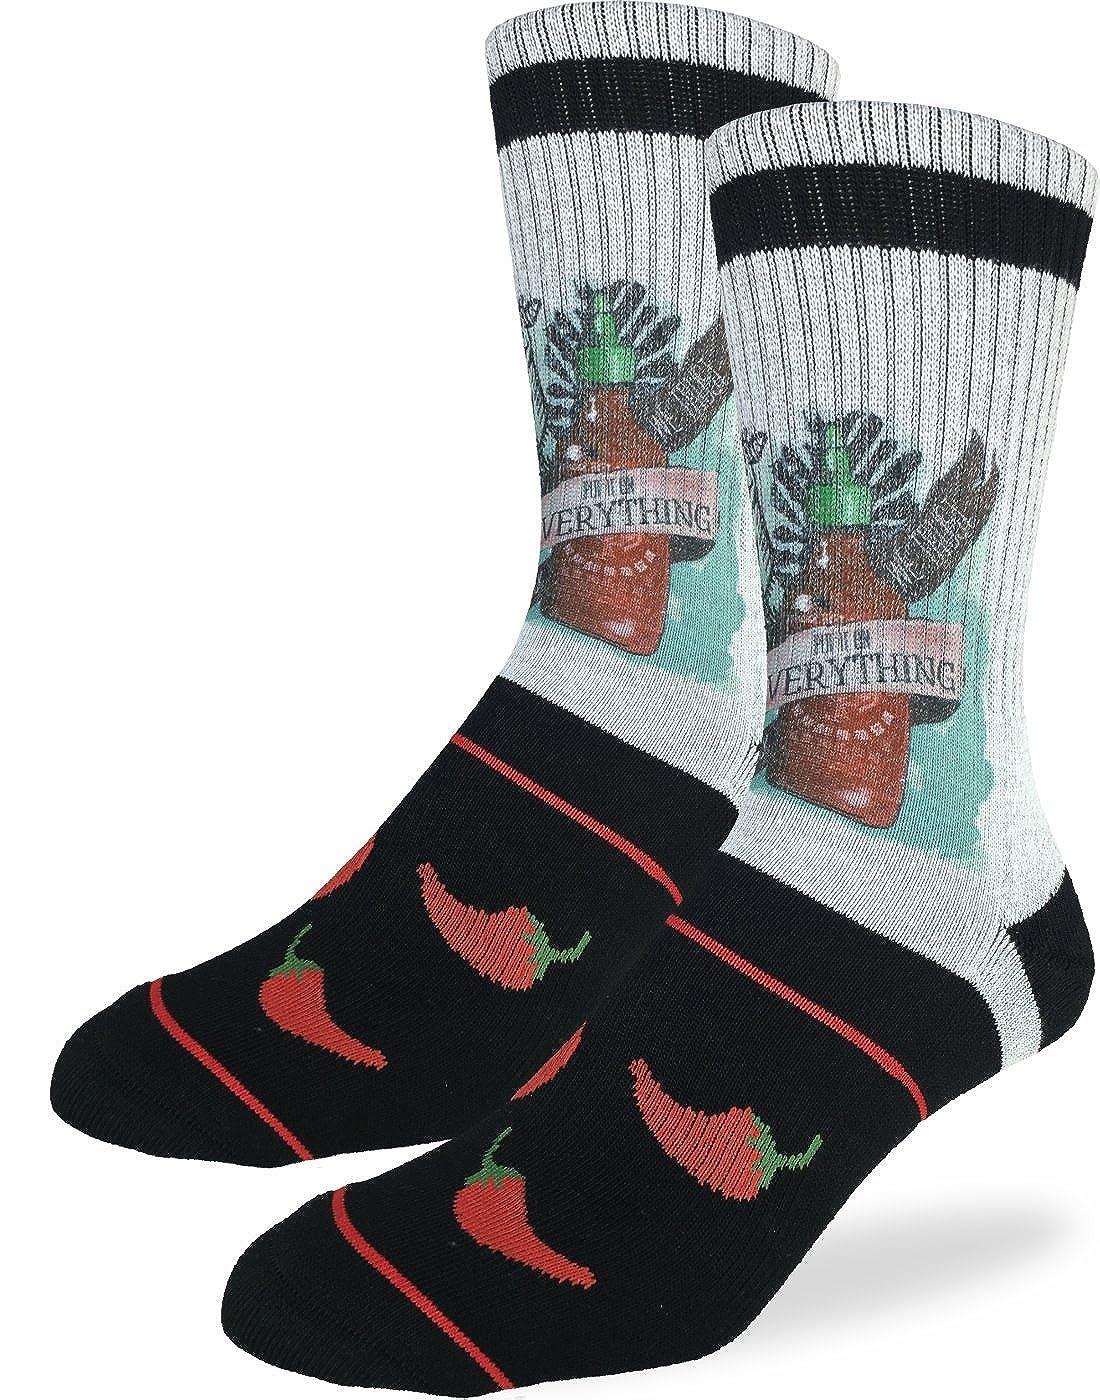 Good Luck Sock Men's Sriracha Crew Socks - Grey, Adult Shoe size 8-13 4042